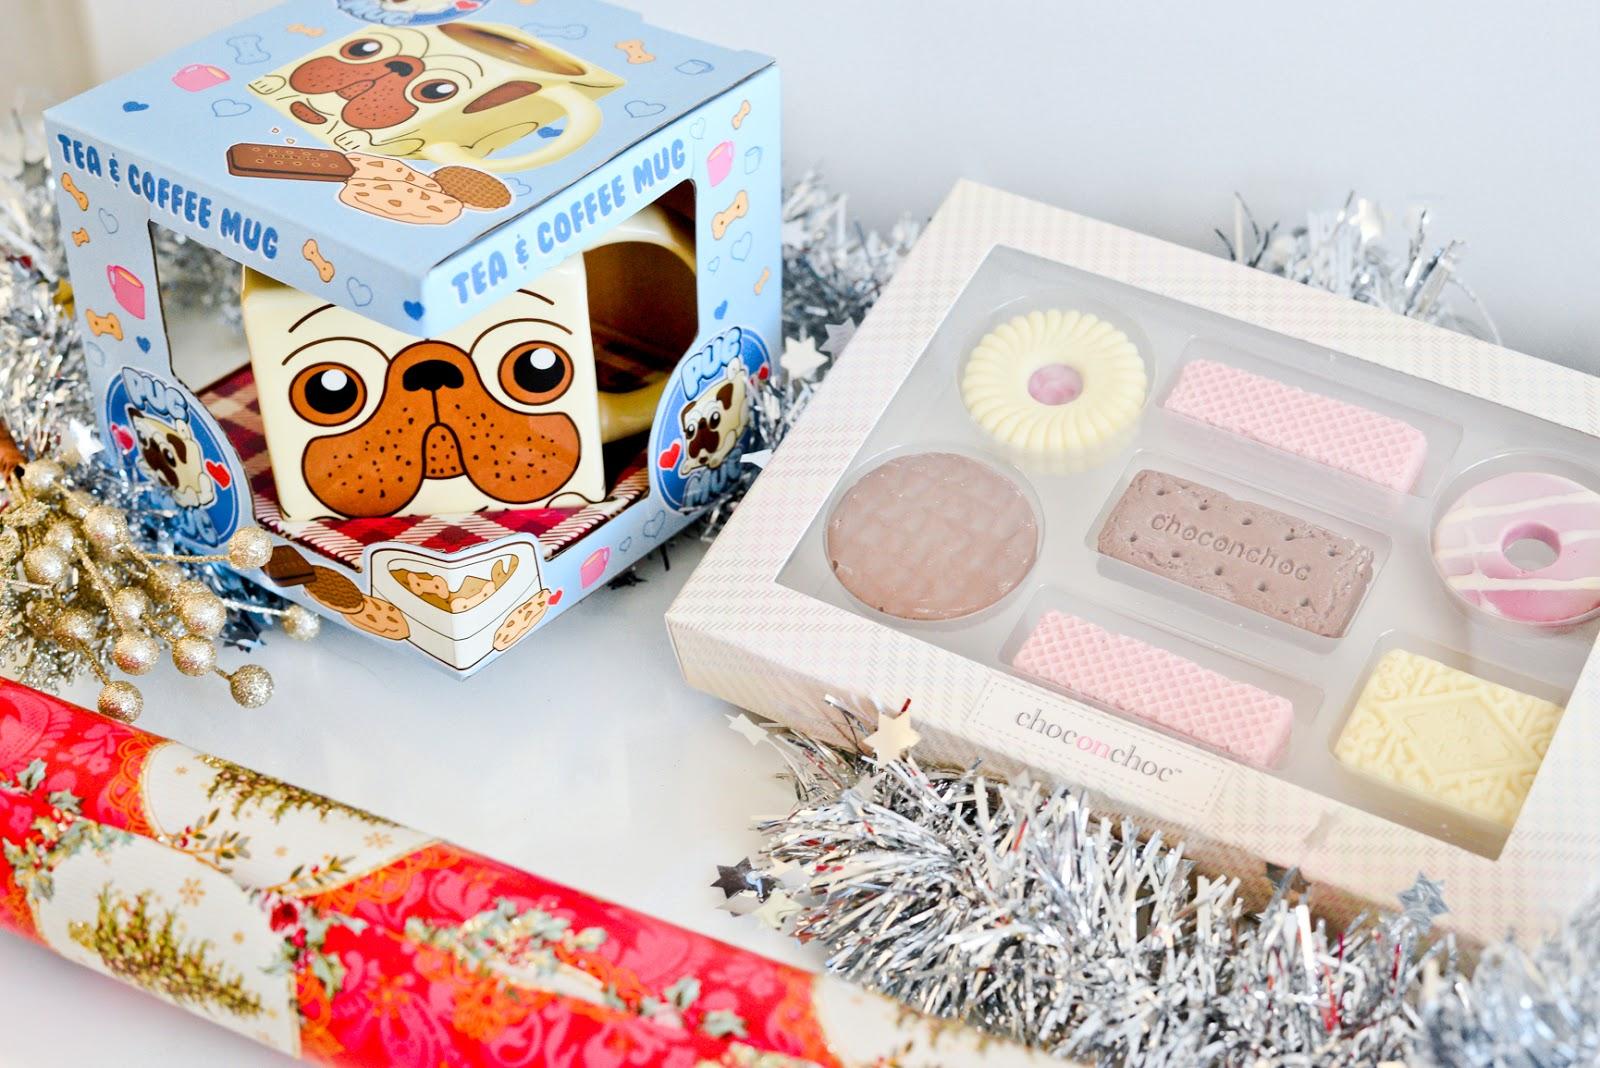 pug mug, biscuit chocolates